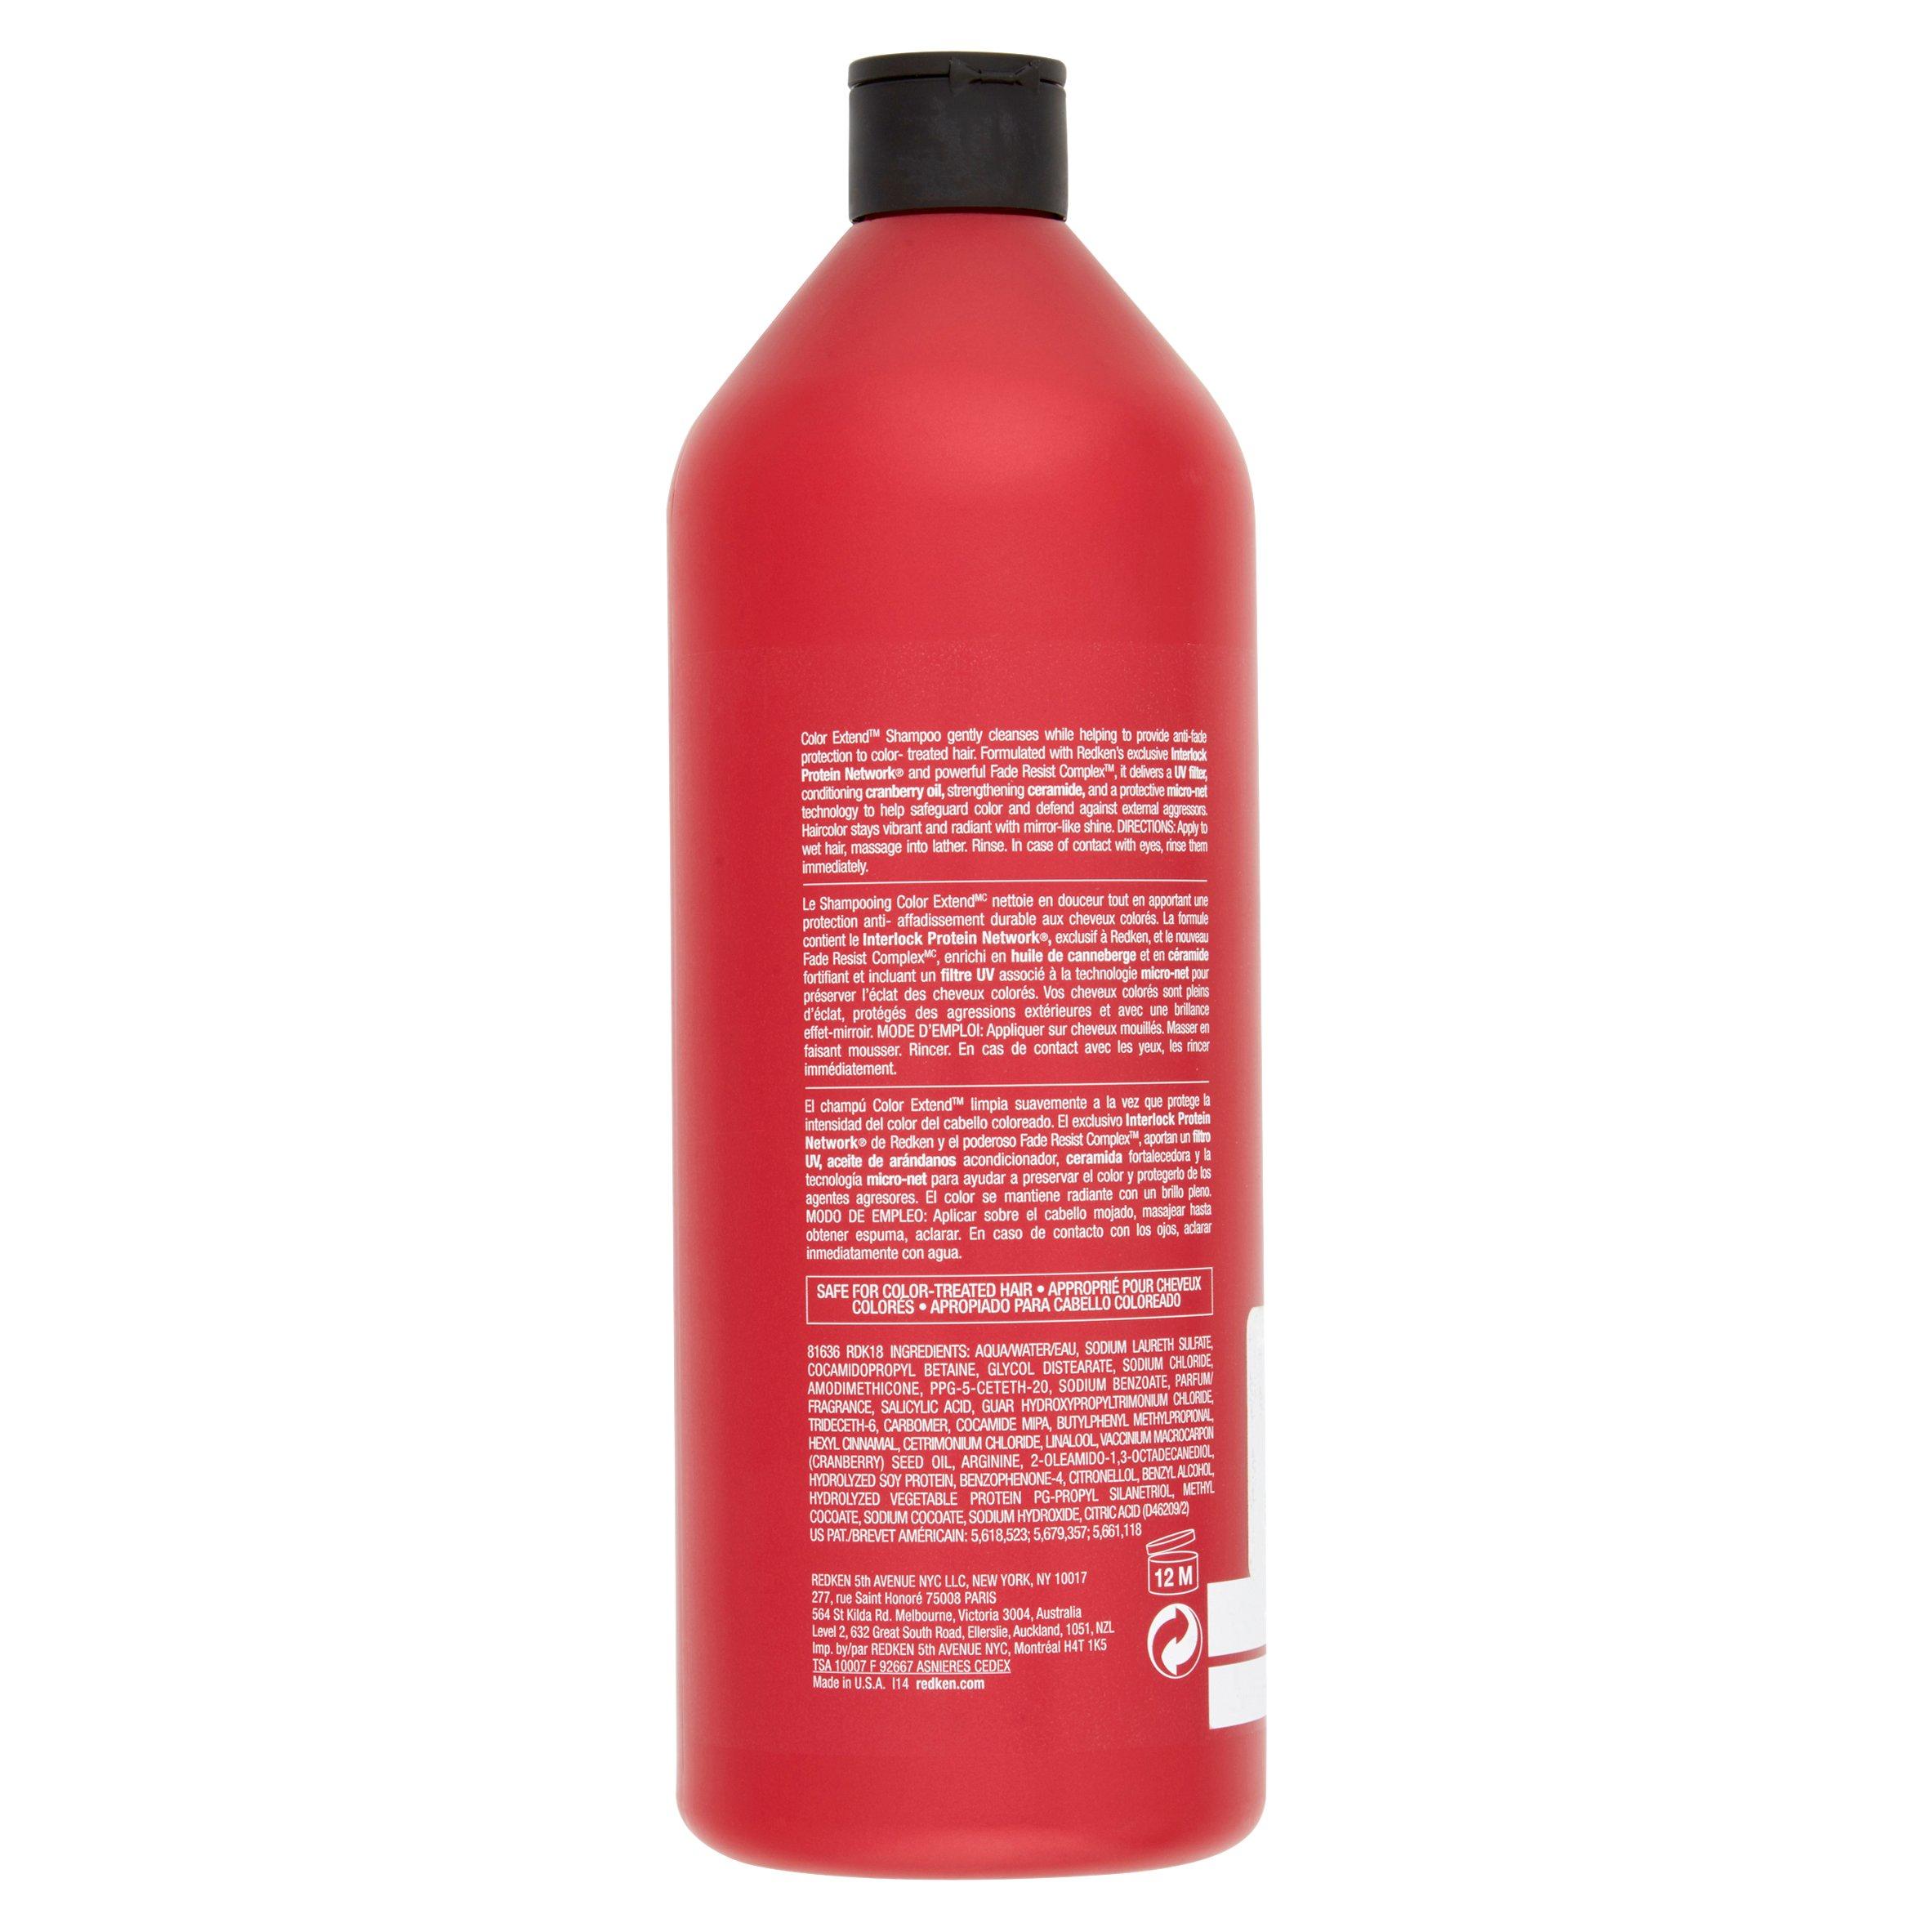 Redken Color Extend Shampoo 338 Oz Walmart